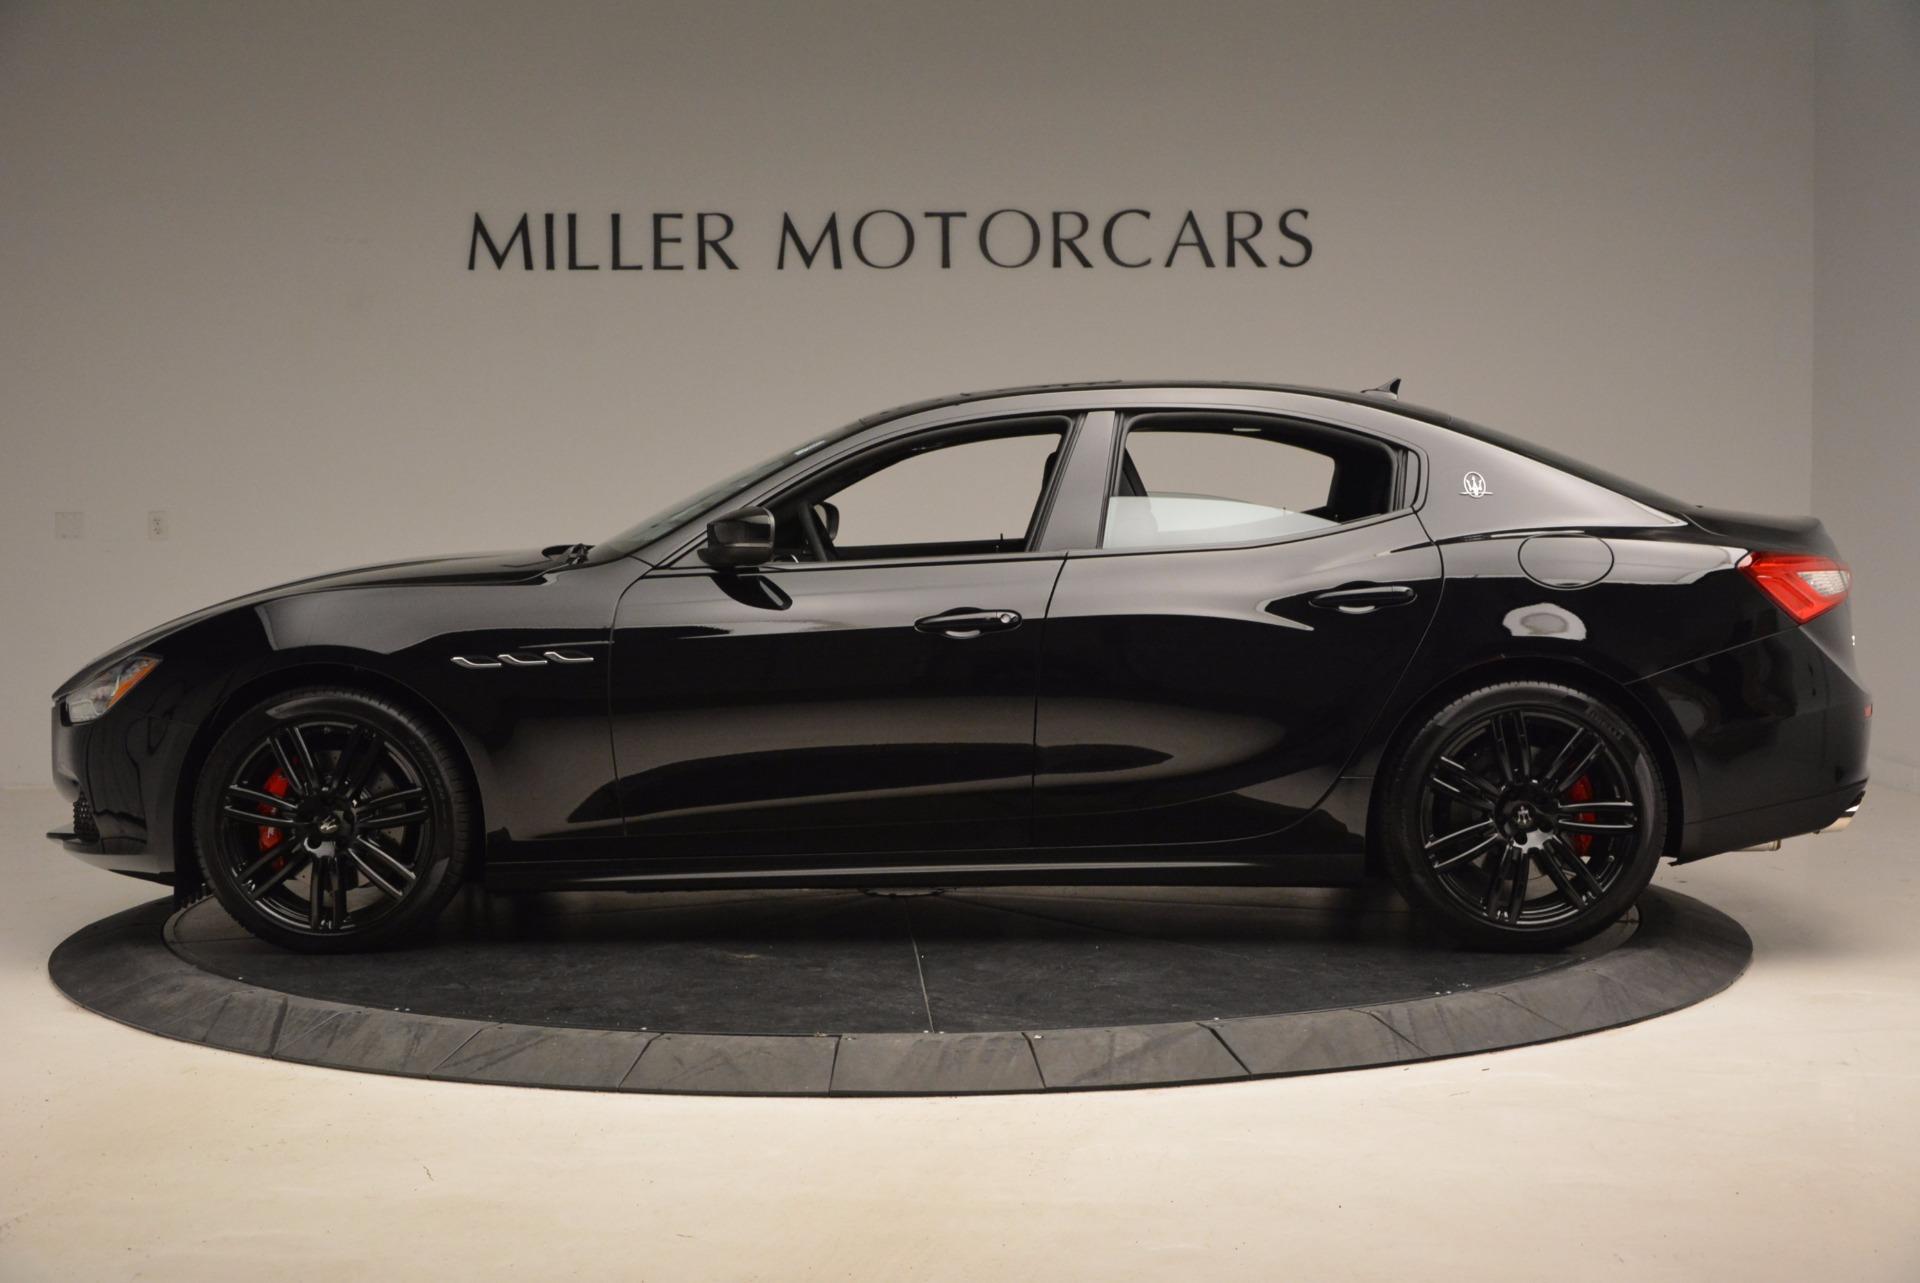 New 2017 Maserati Ghibli Nerissimo Edition S Q4 For Sale In Westport, CT 1420_p3